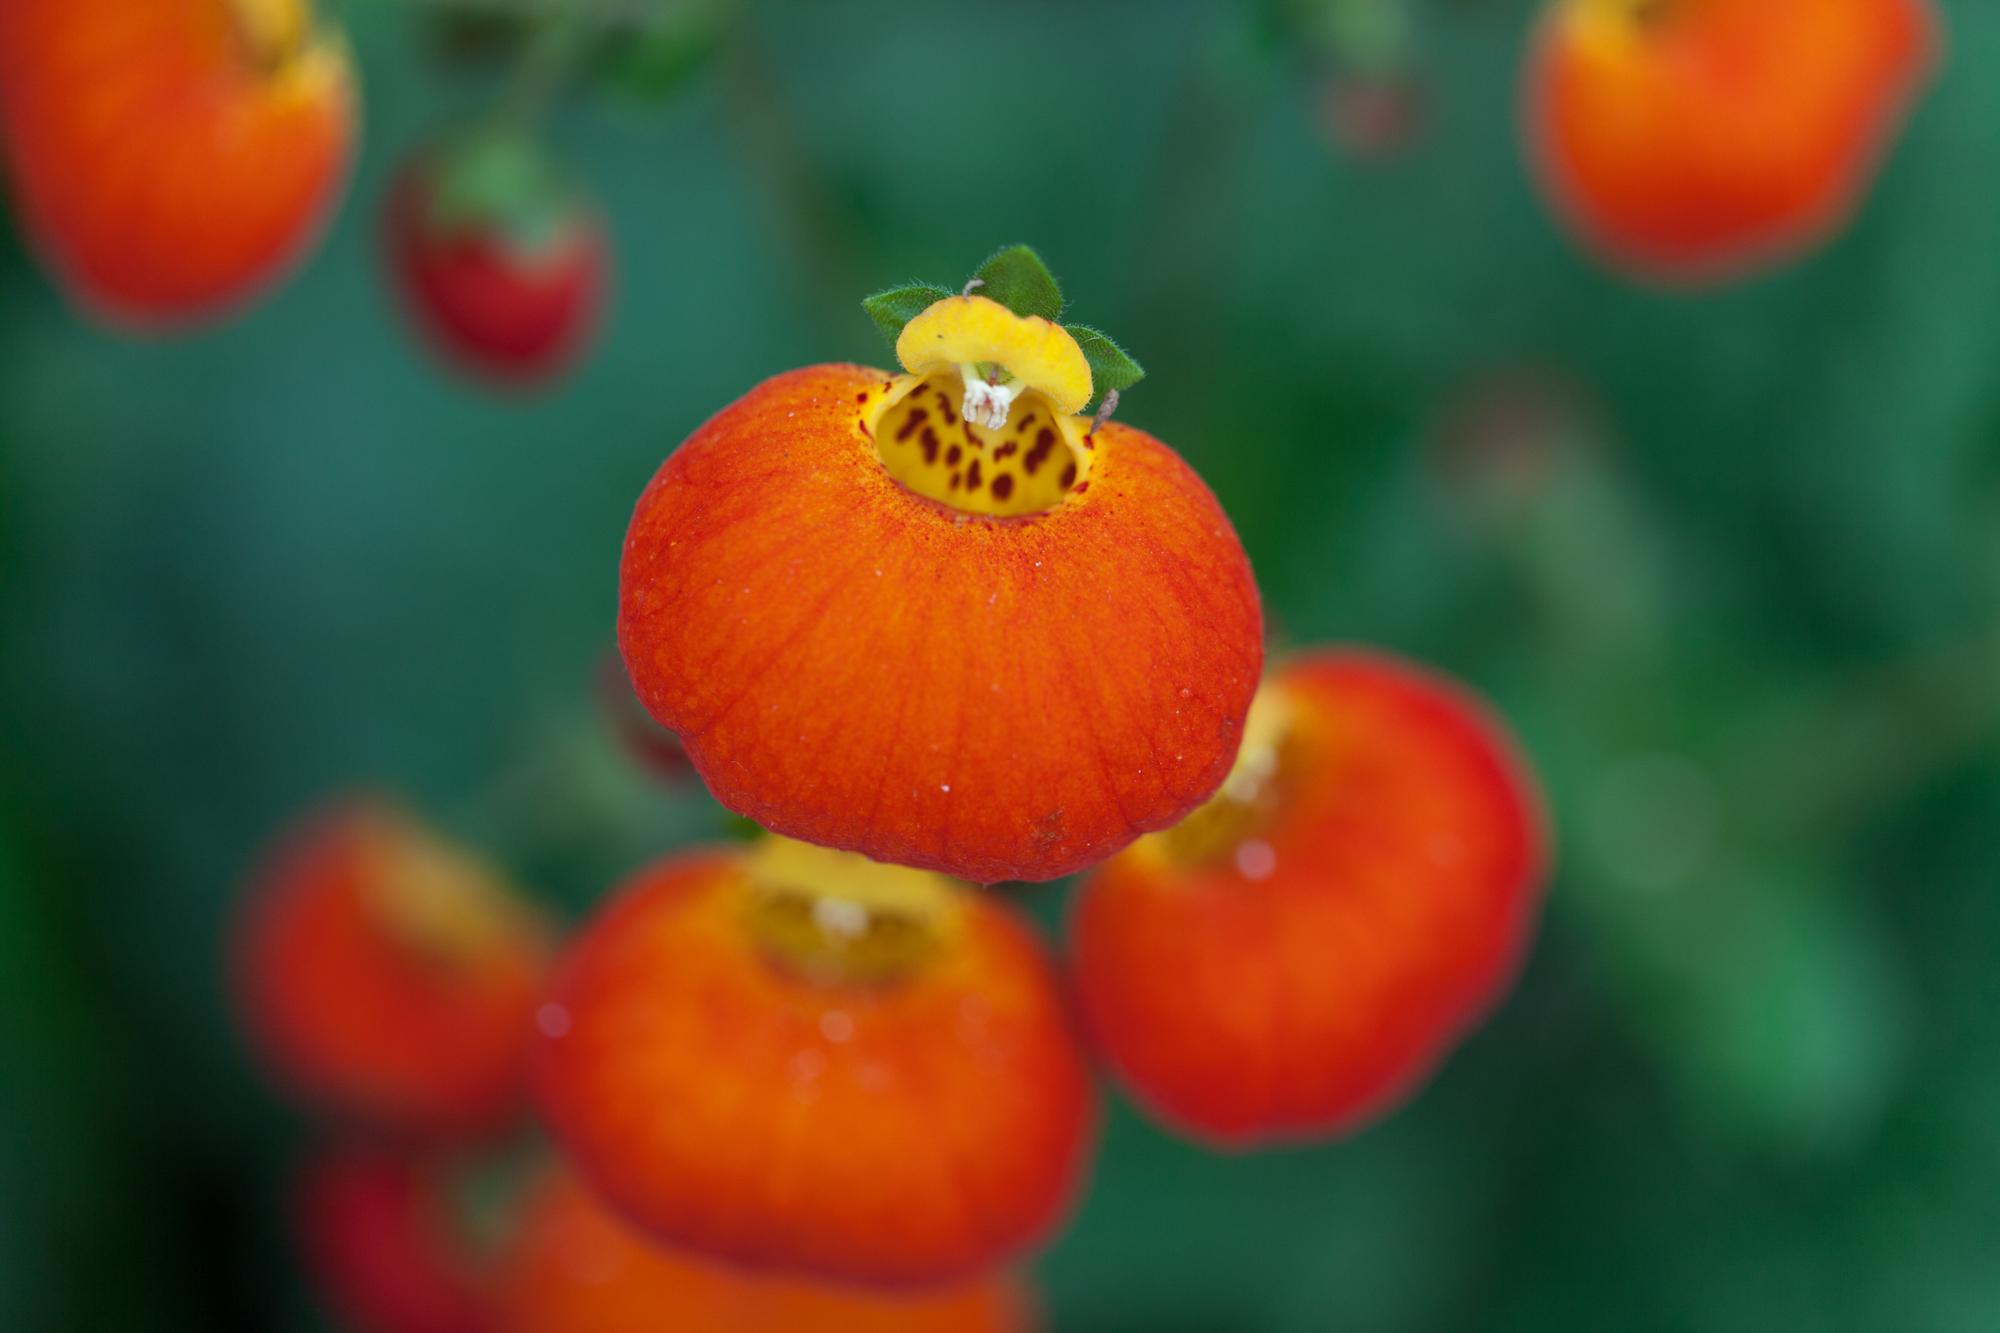 Pocketbush flower at the Garfield Park Conservatory.